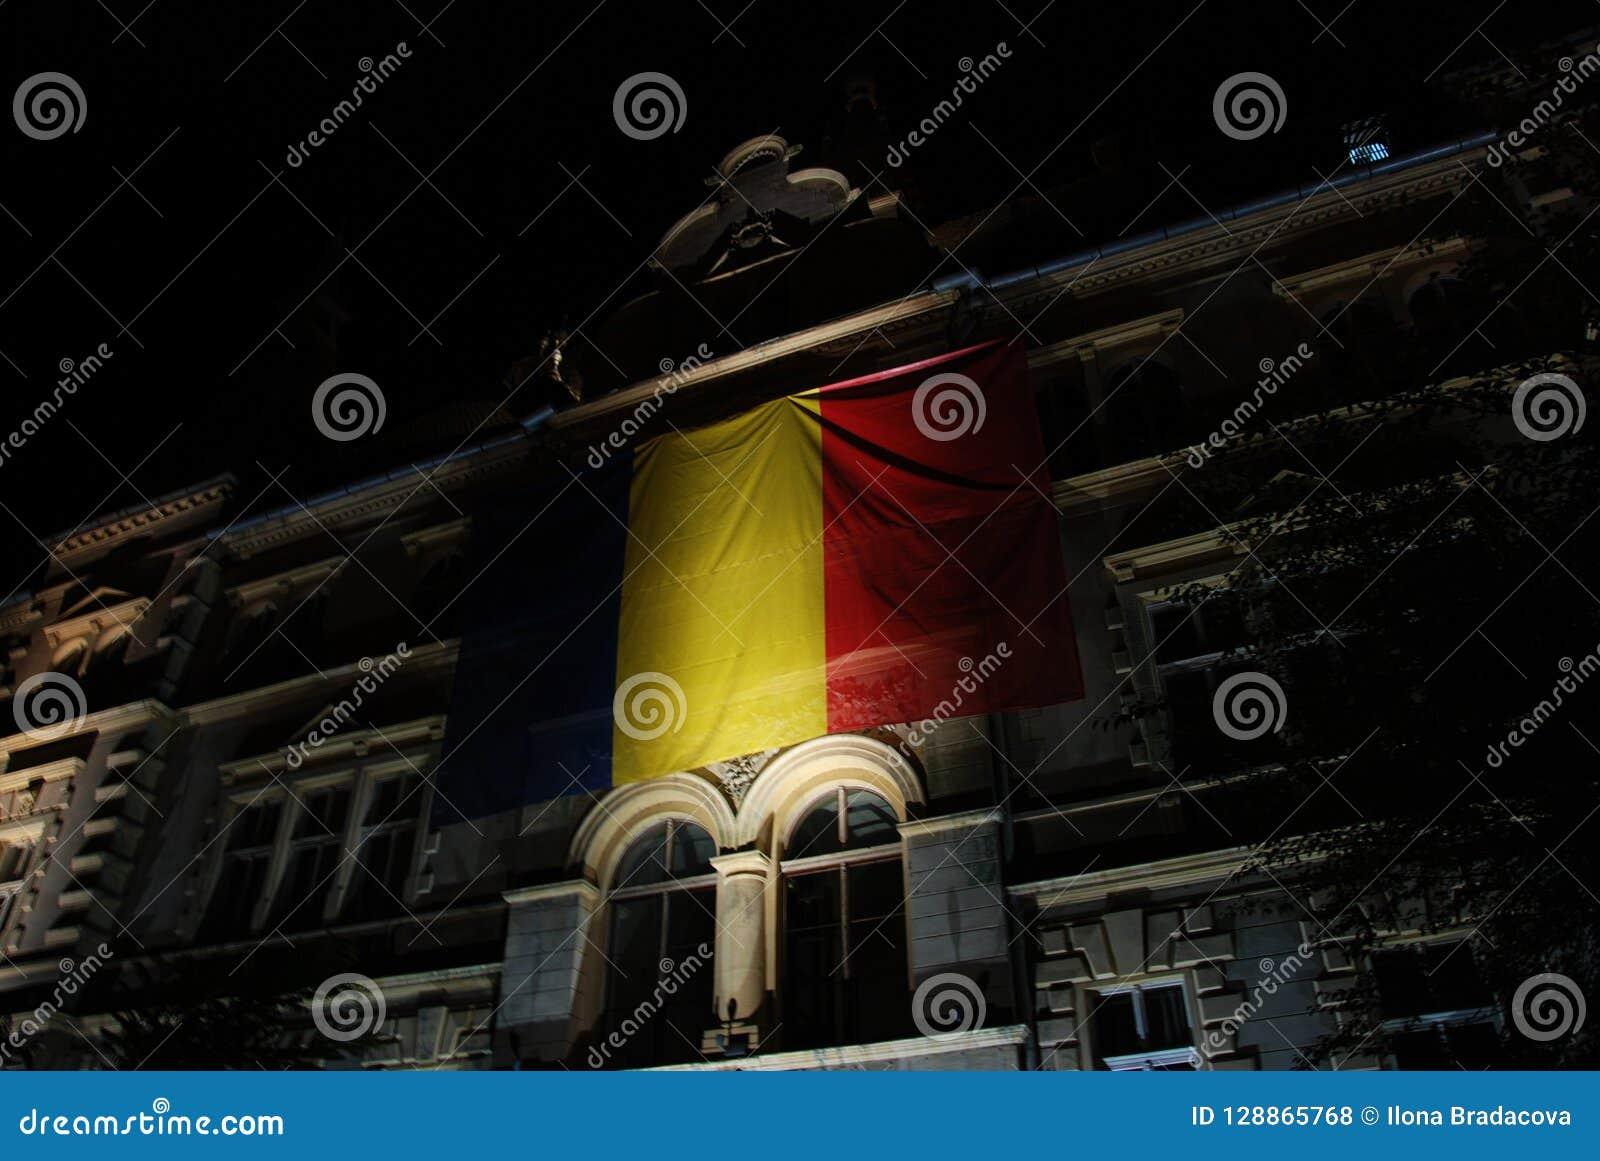 Drapeau roumain illuminé la nuit